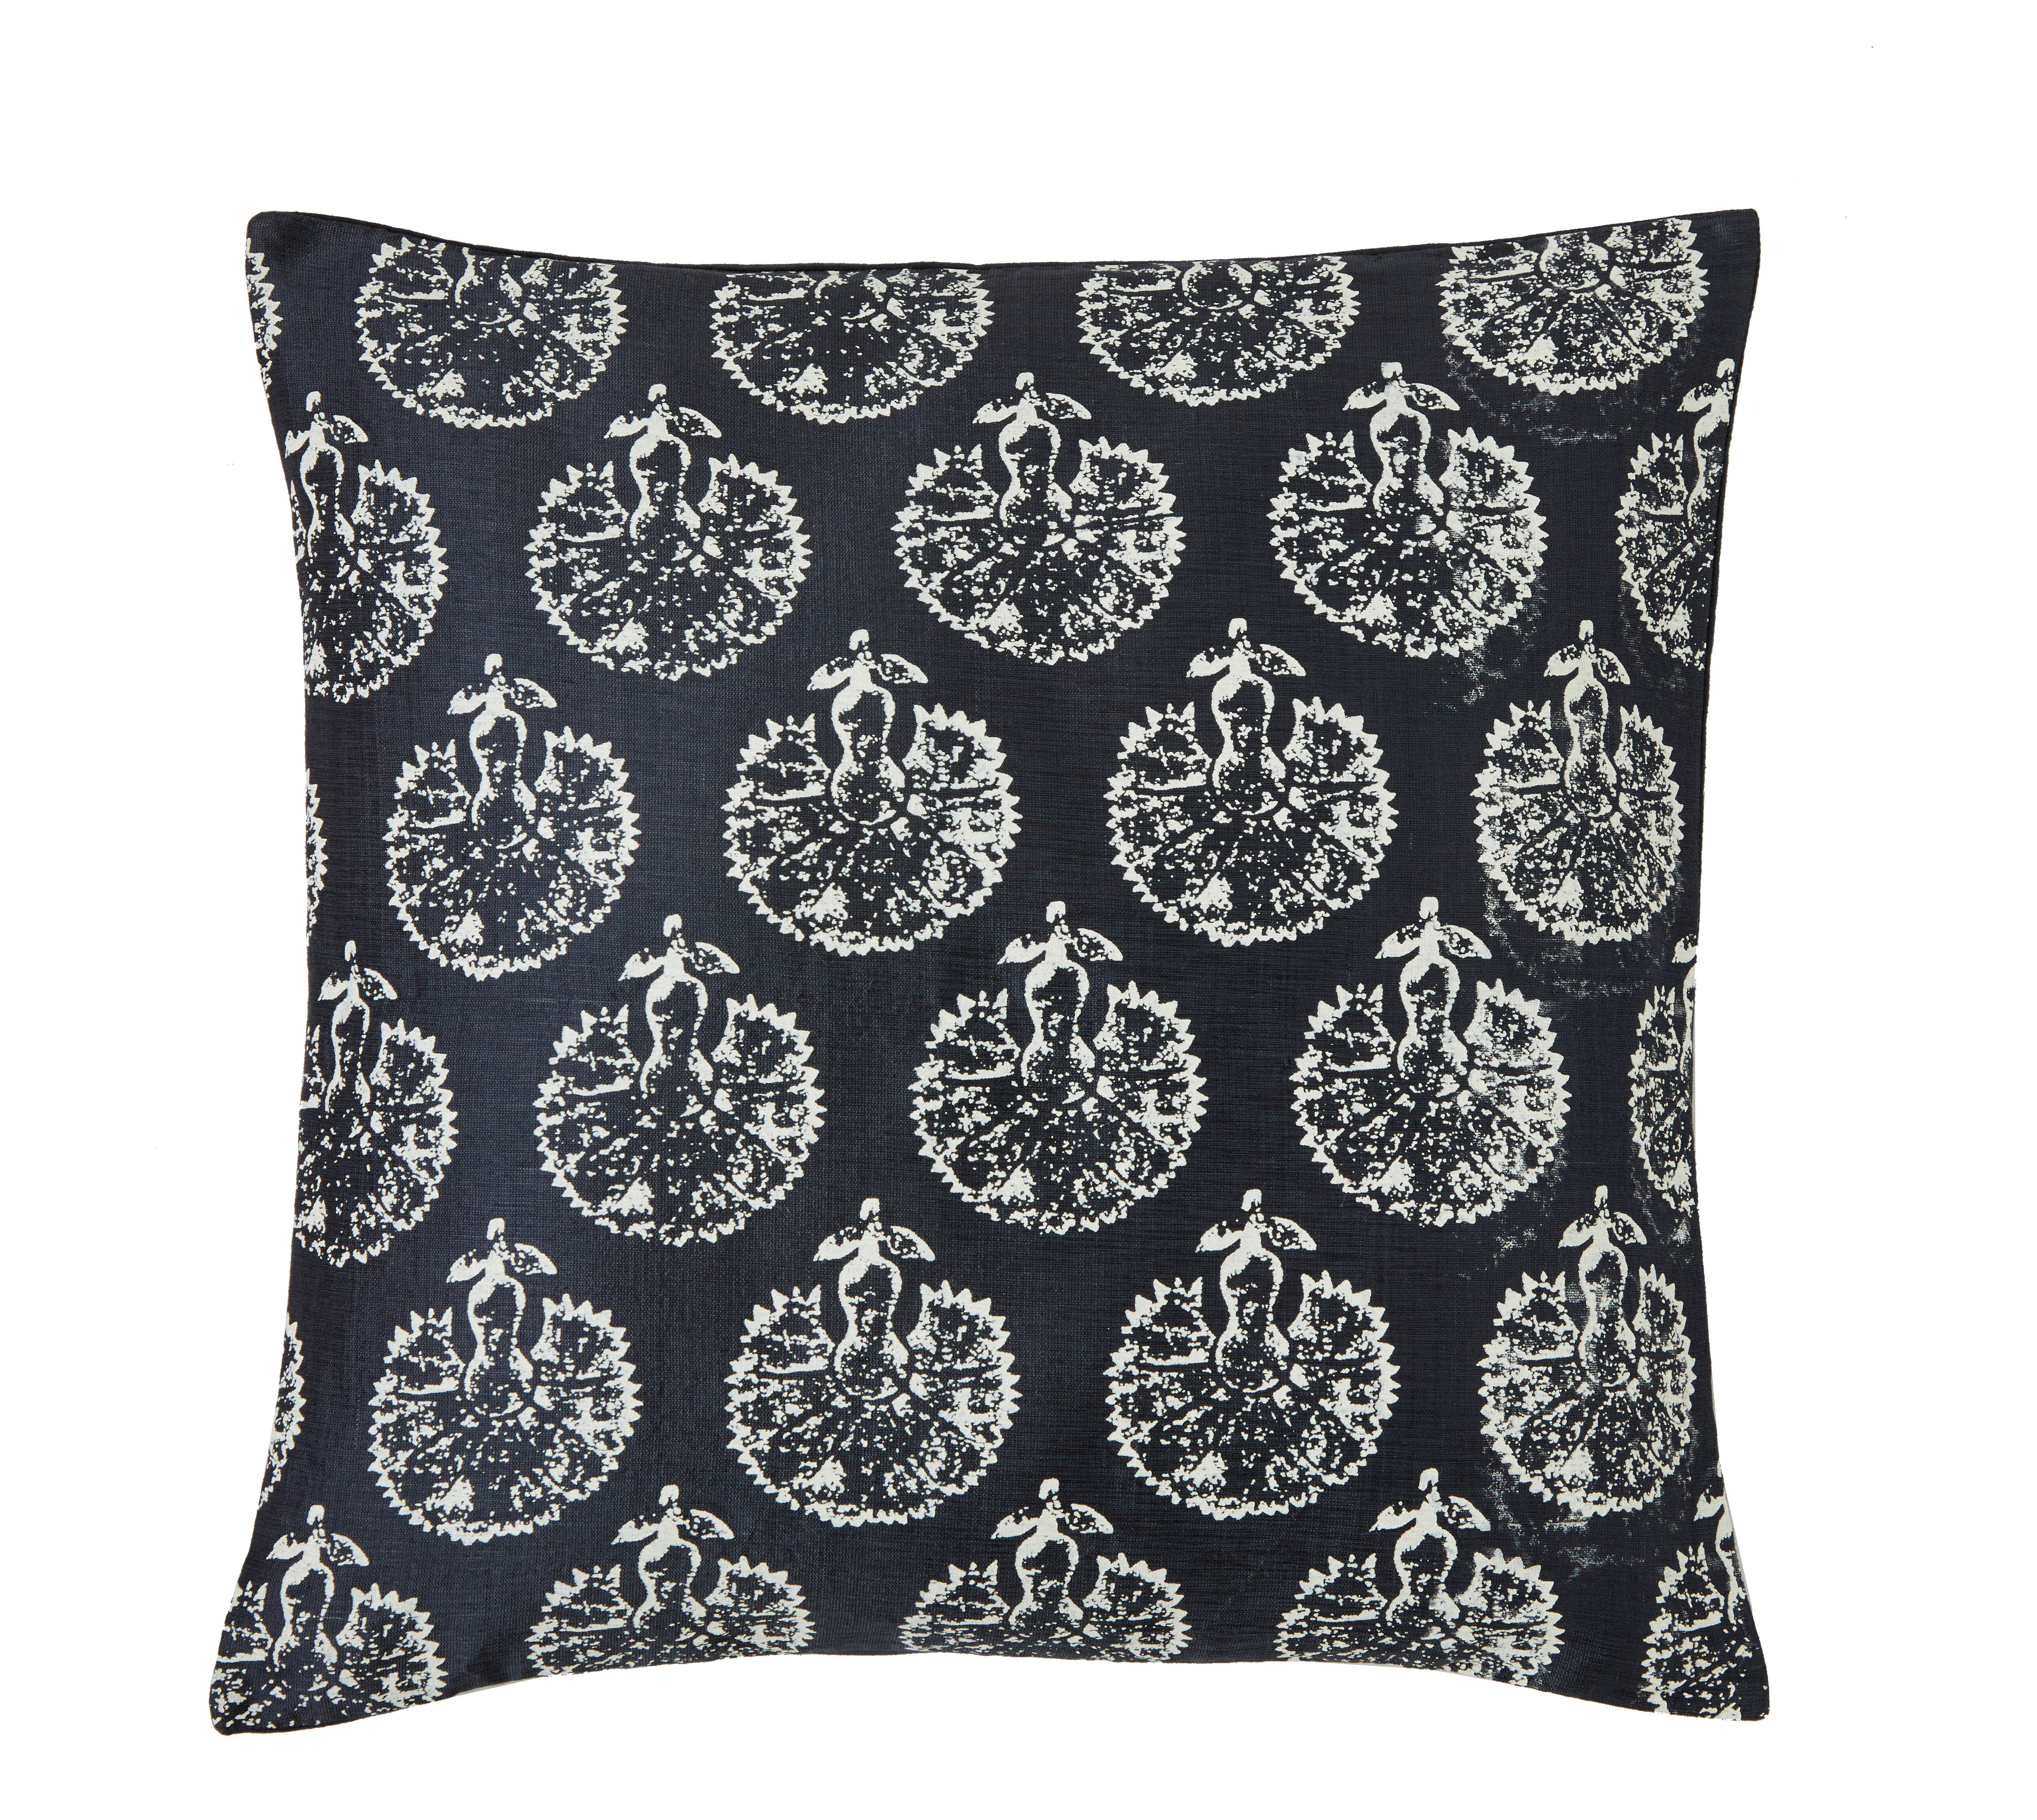 marco polo bleu paon. Black Bedroom Furniture Sets. Home Design Ideas